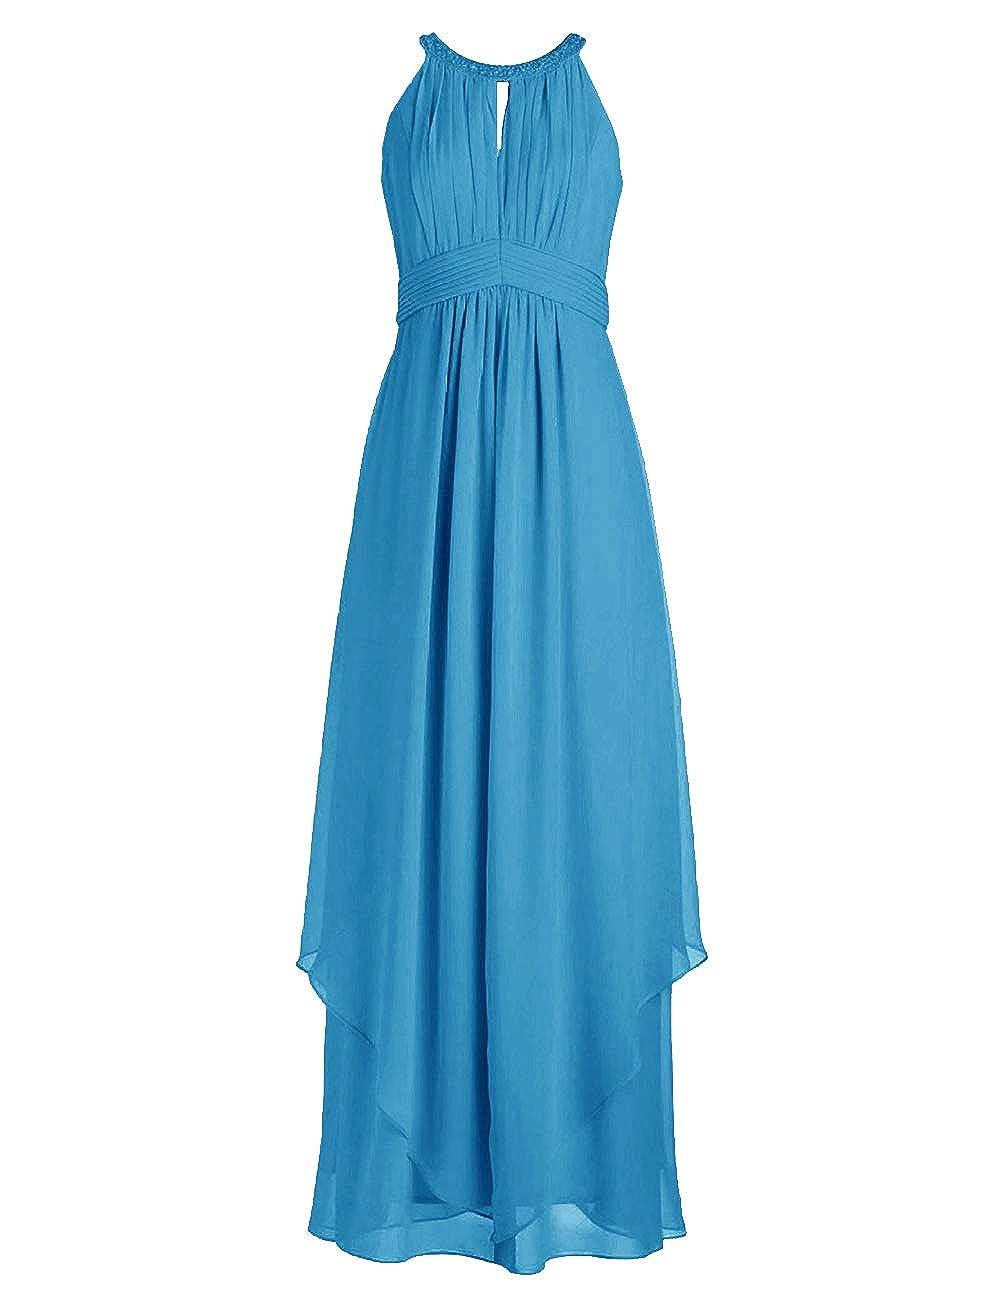 bluee Bridesmaid Dresses Halter Evening Party Dress Long Bridesmaid Gowns Ruffles